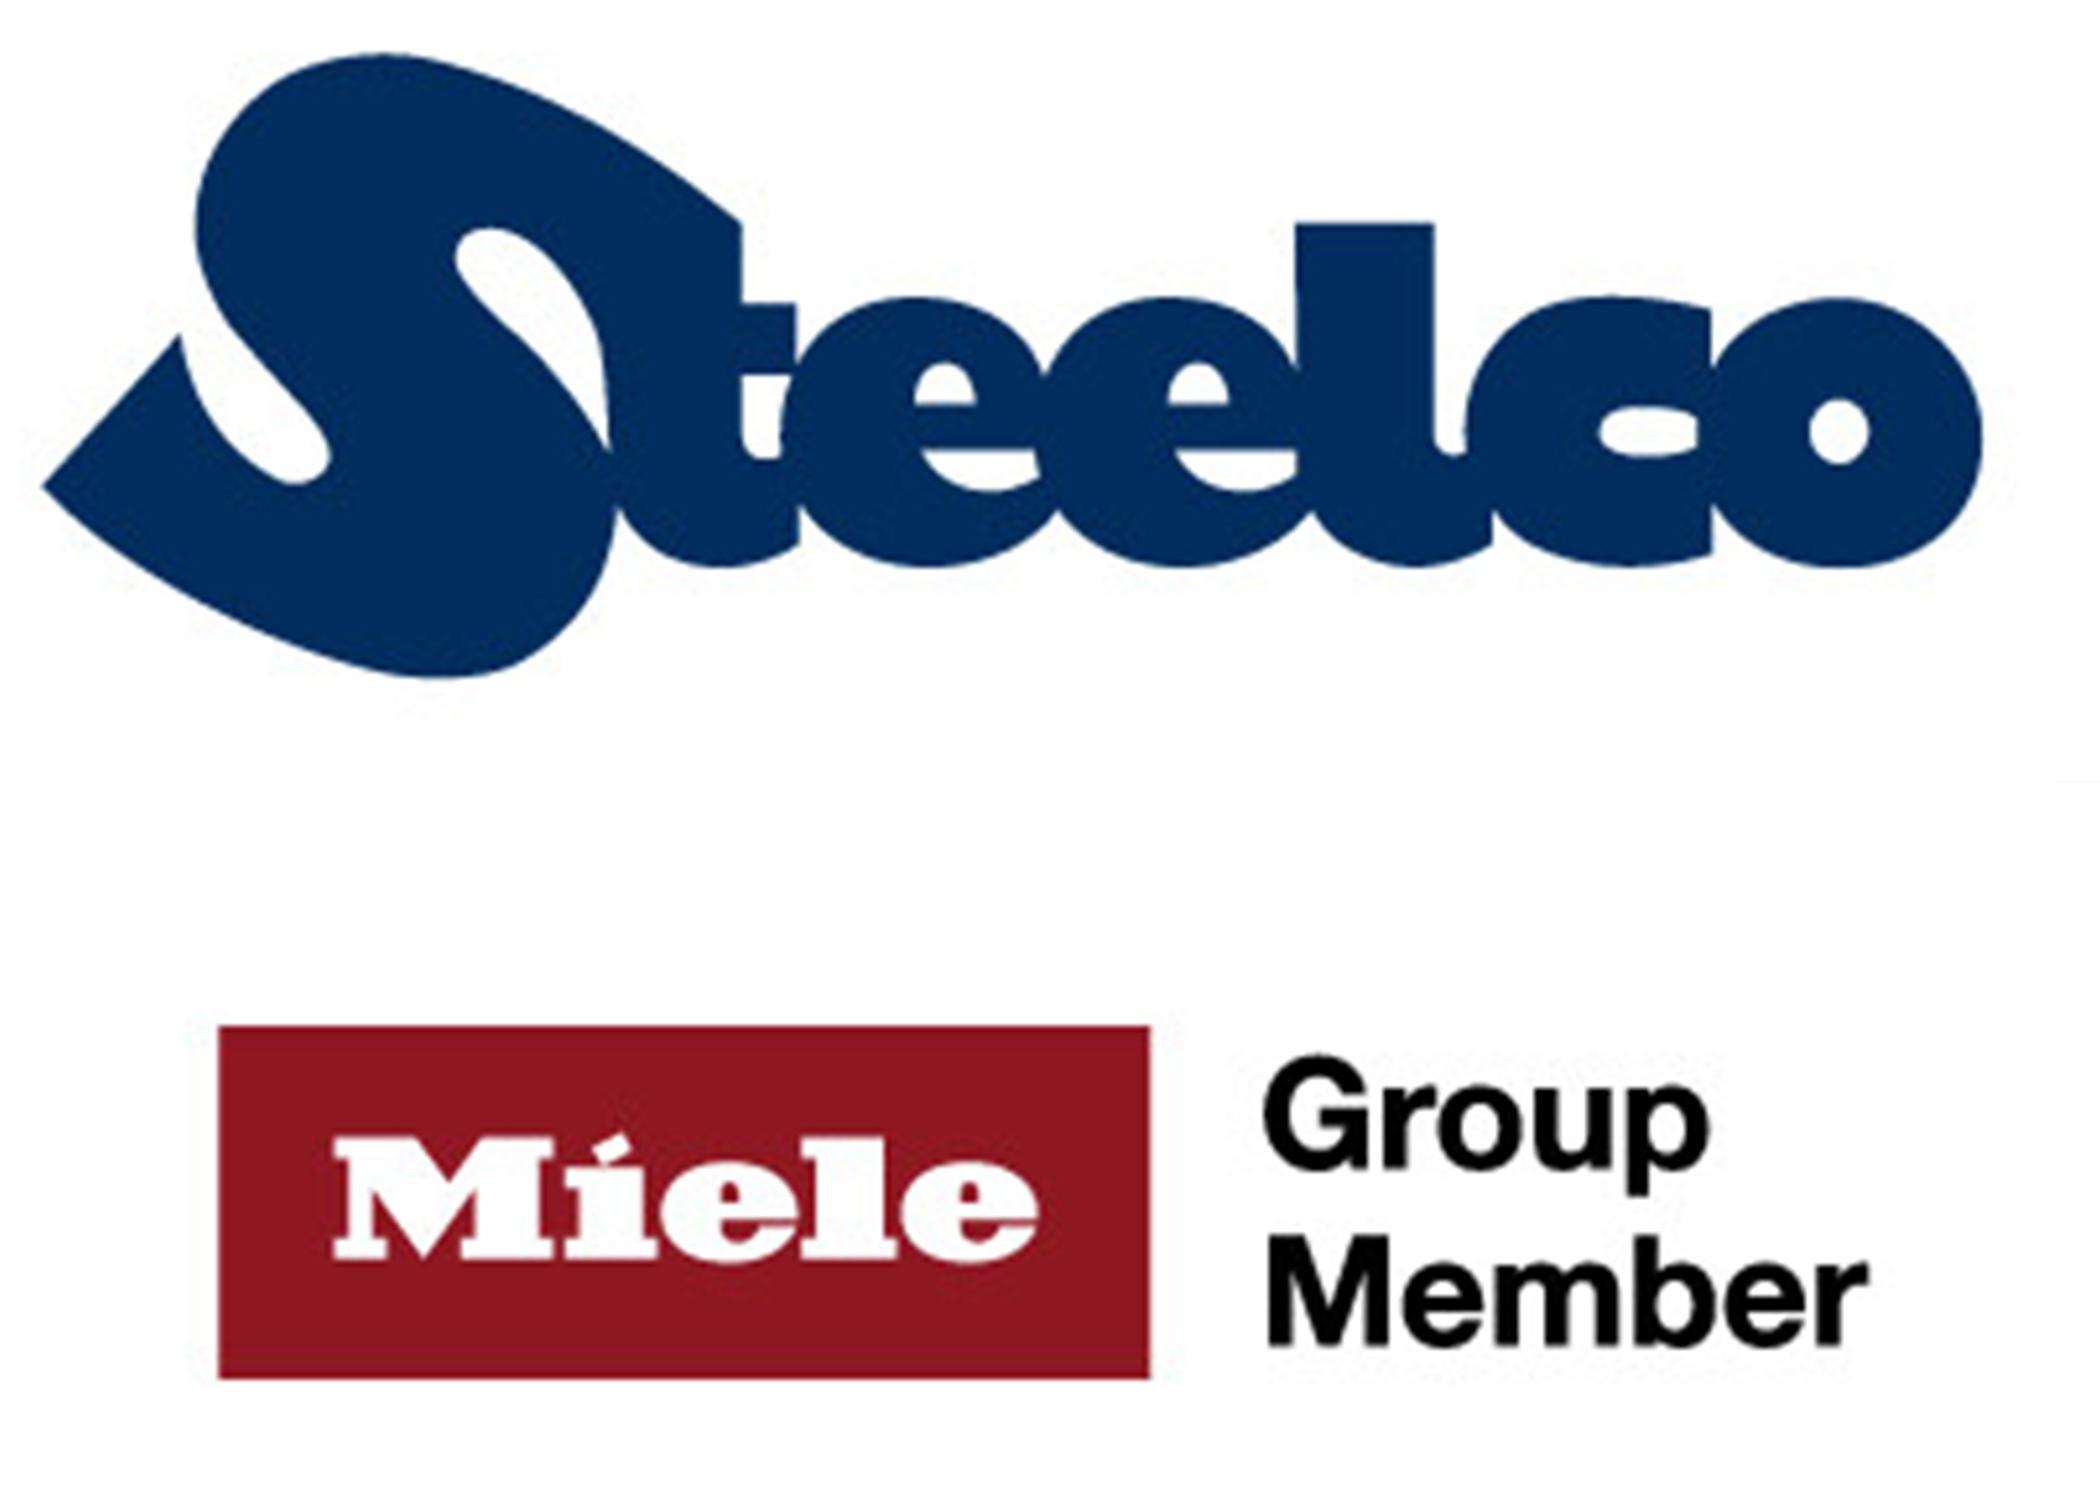 Steelco and Miele logo.